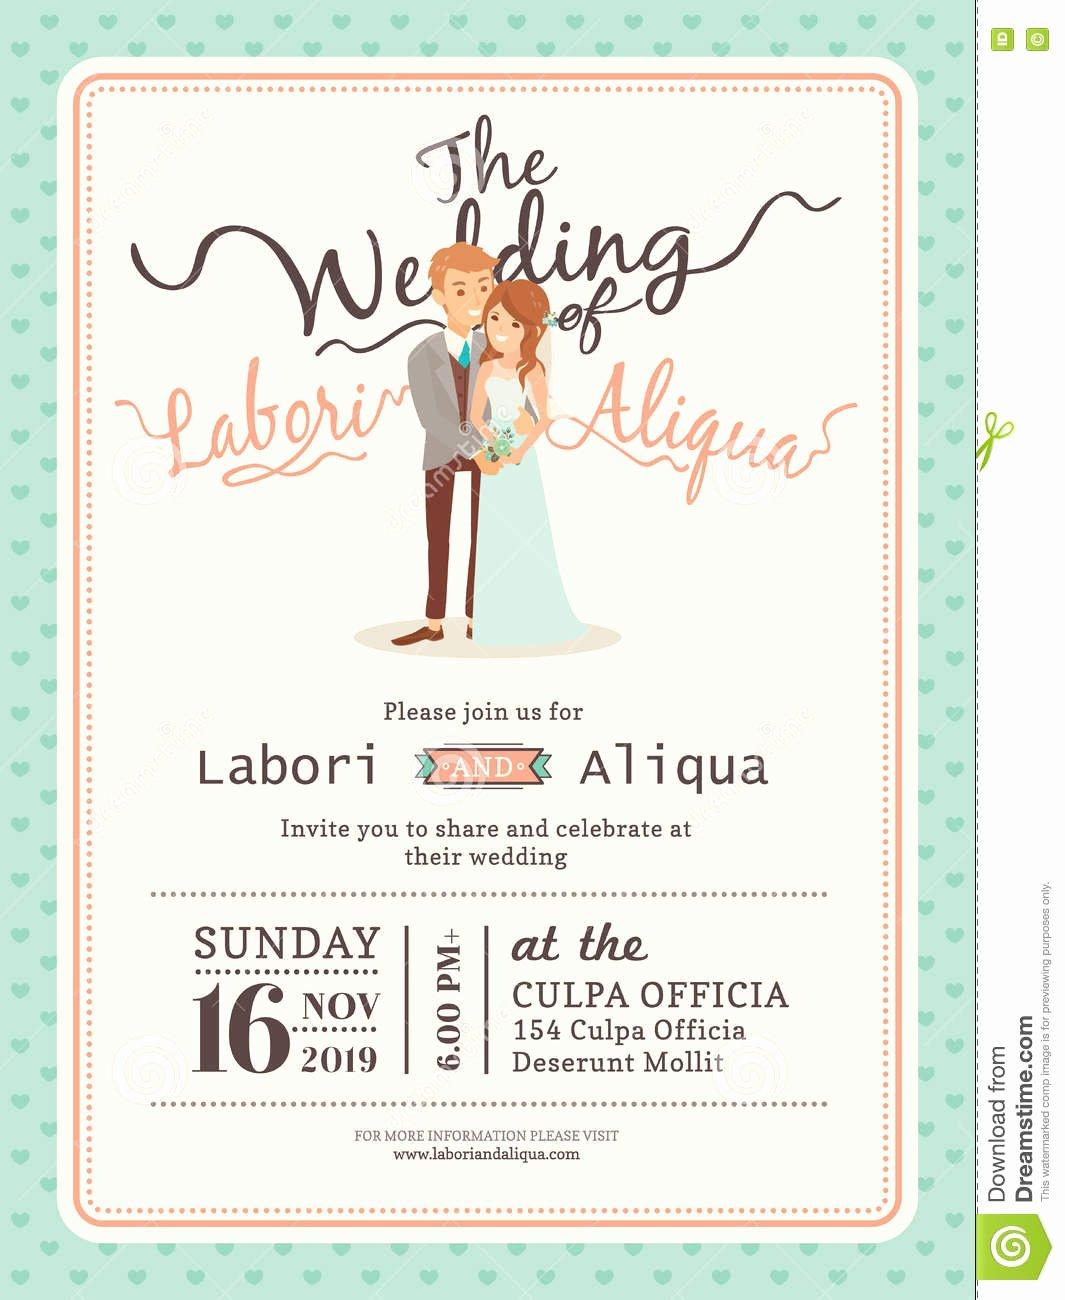 Bridesmaid Card Template Awesome Wedding Couple Groom and Bride Cartoon Wedding Card